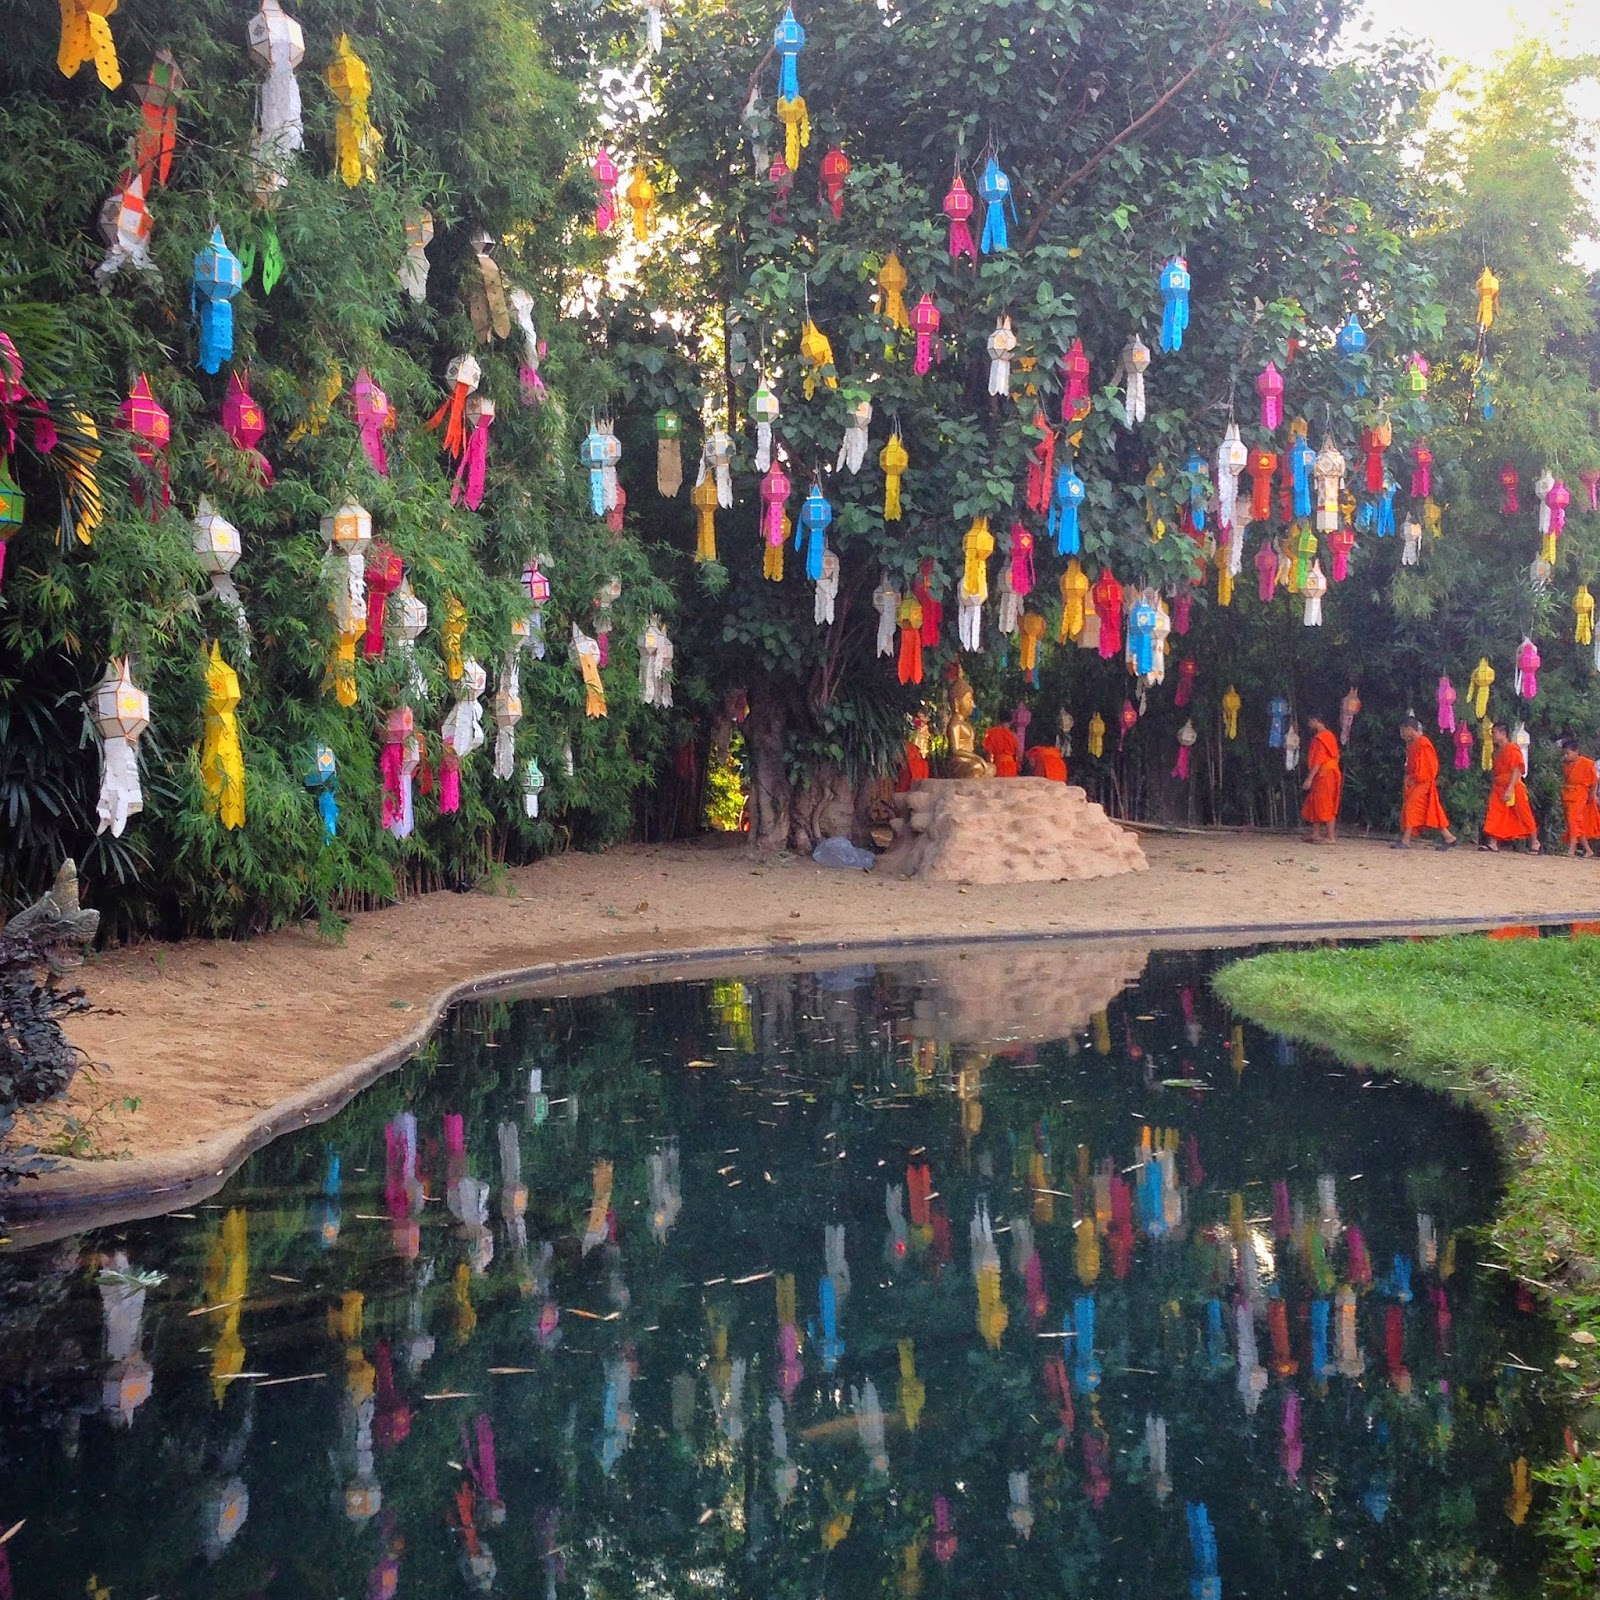 La meraviglia del Loy Krathong a Chiang Mai - foto di Elisa Chisana Hoshi